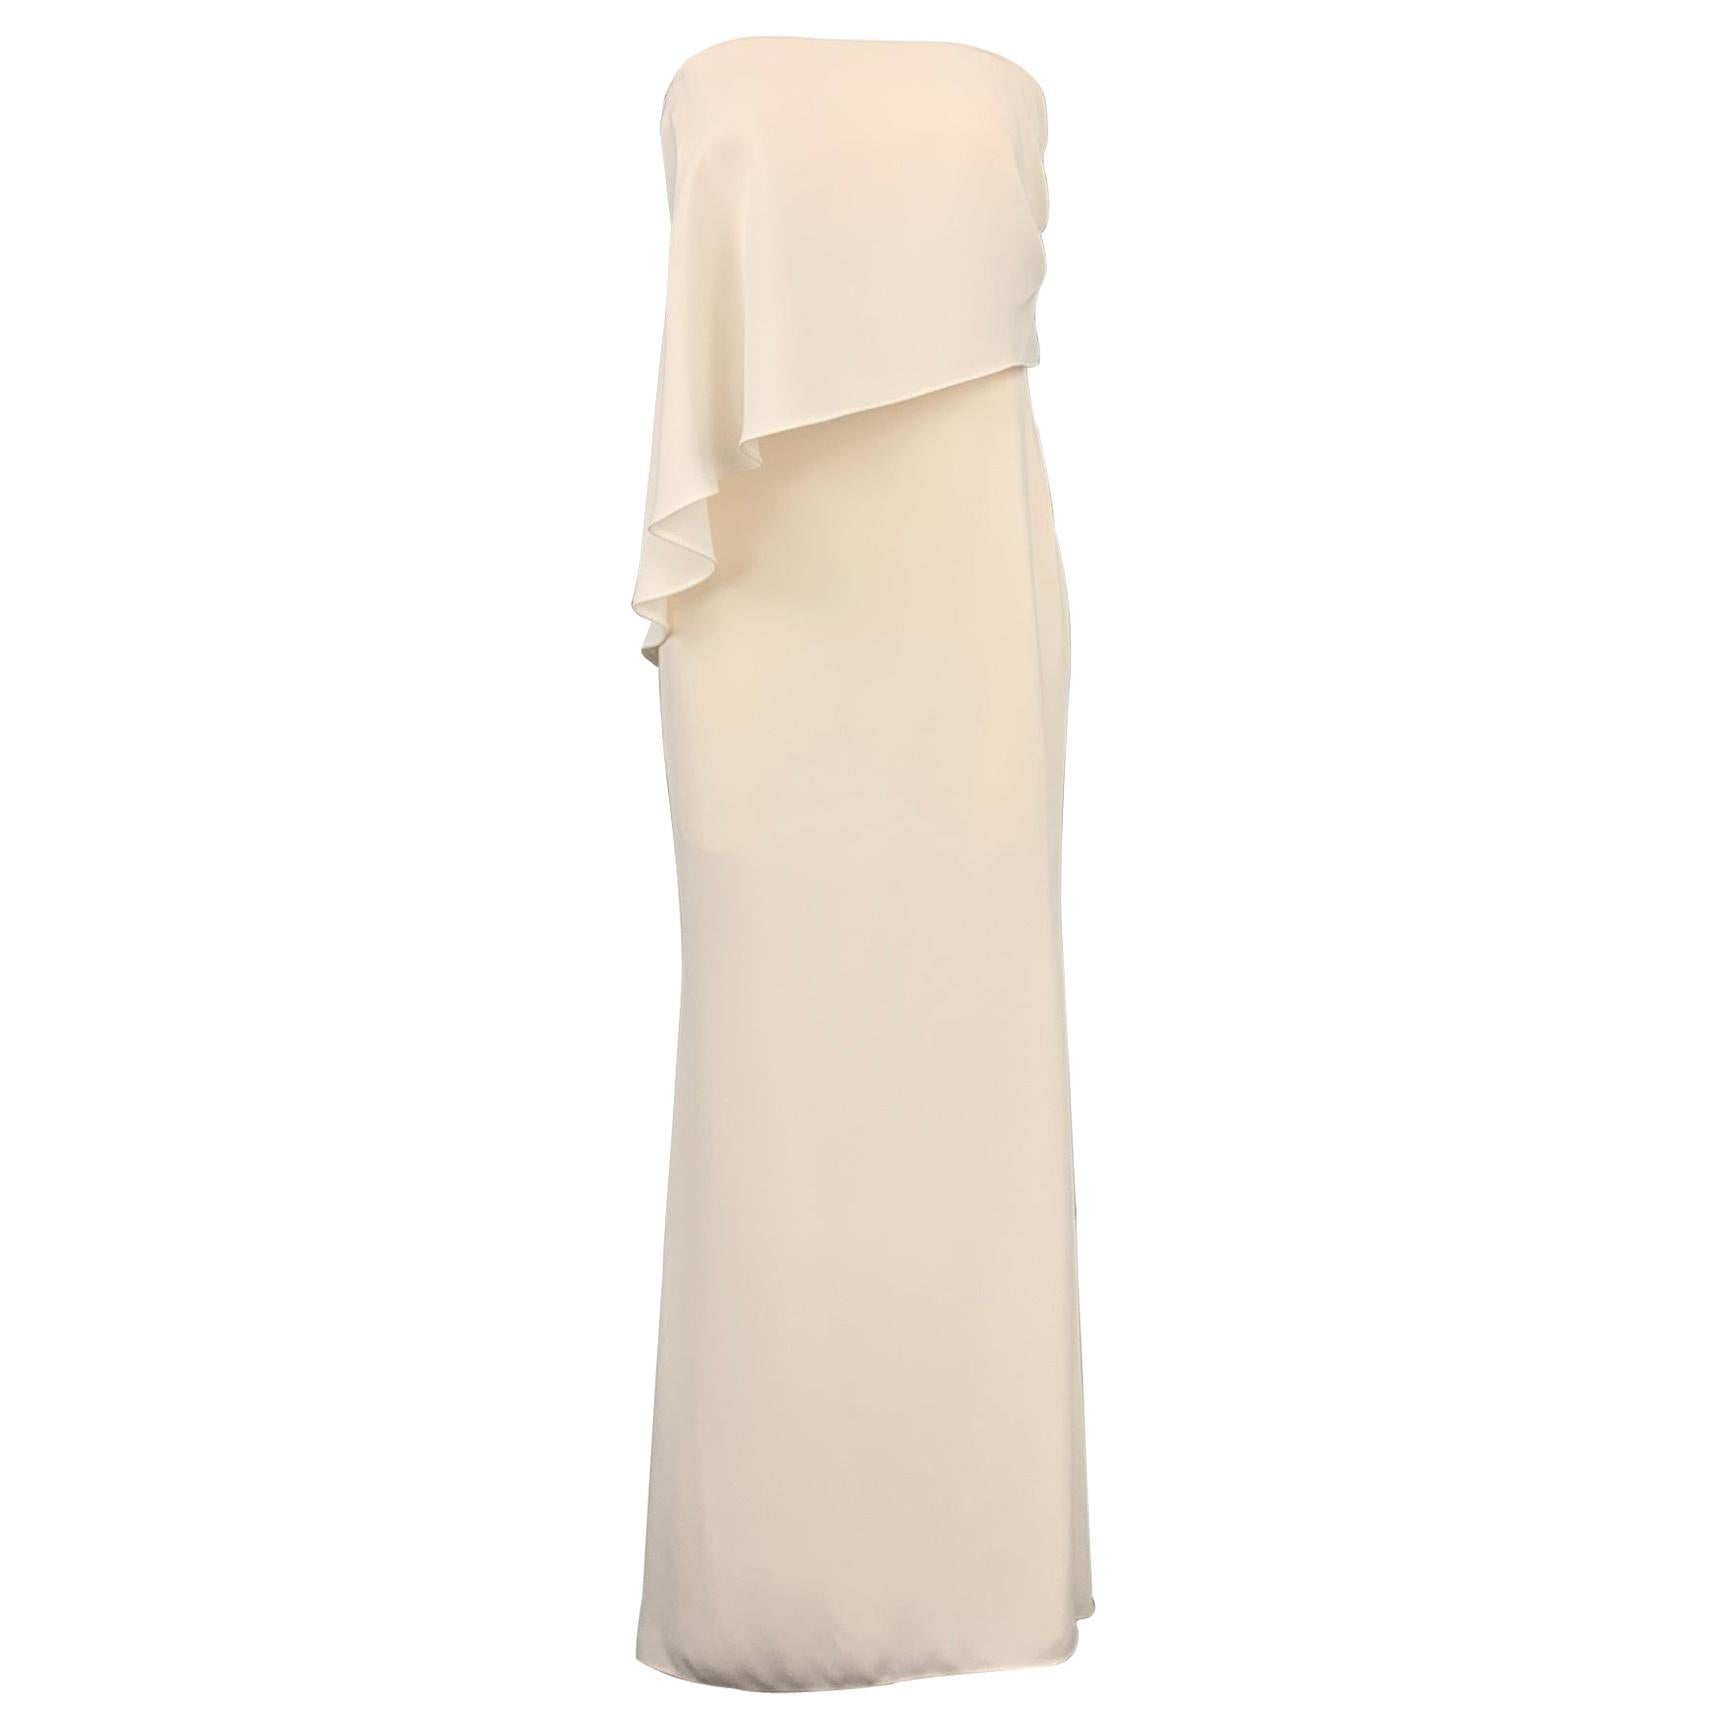 CARMEN MARC VALVO Size 2 Cream Polyester One Shoulder Column Gown